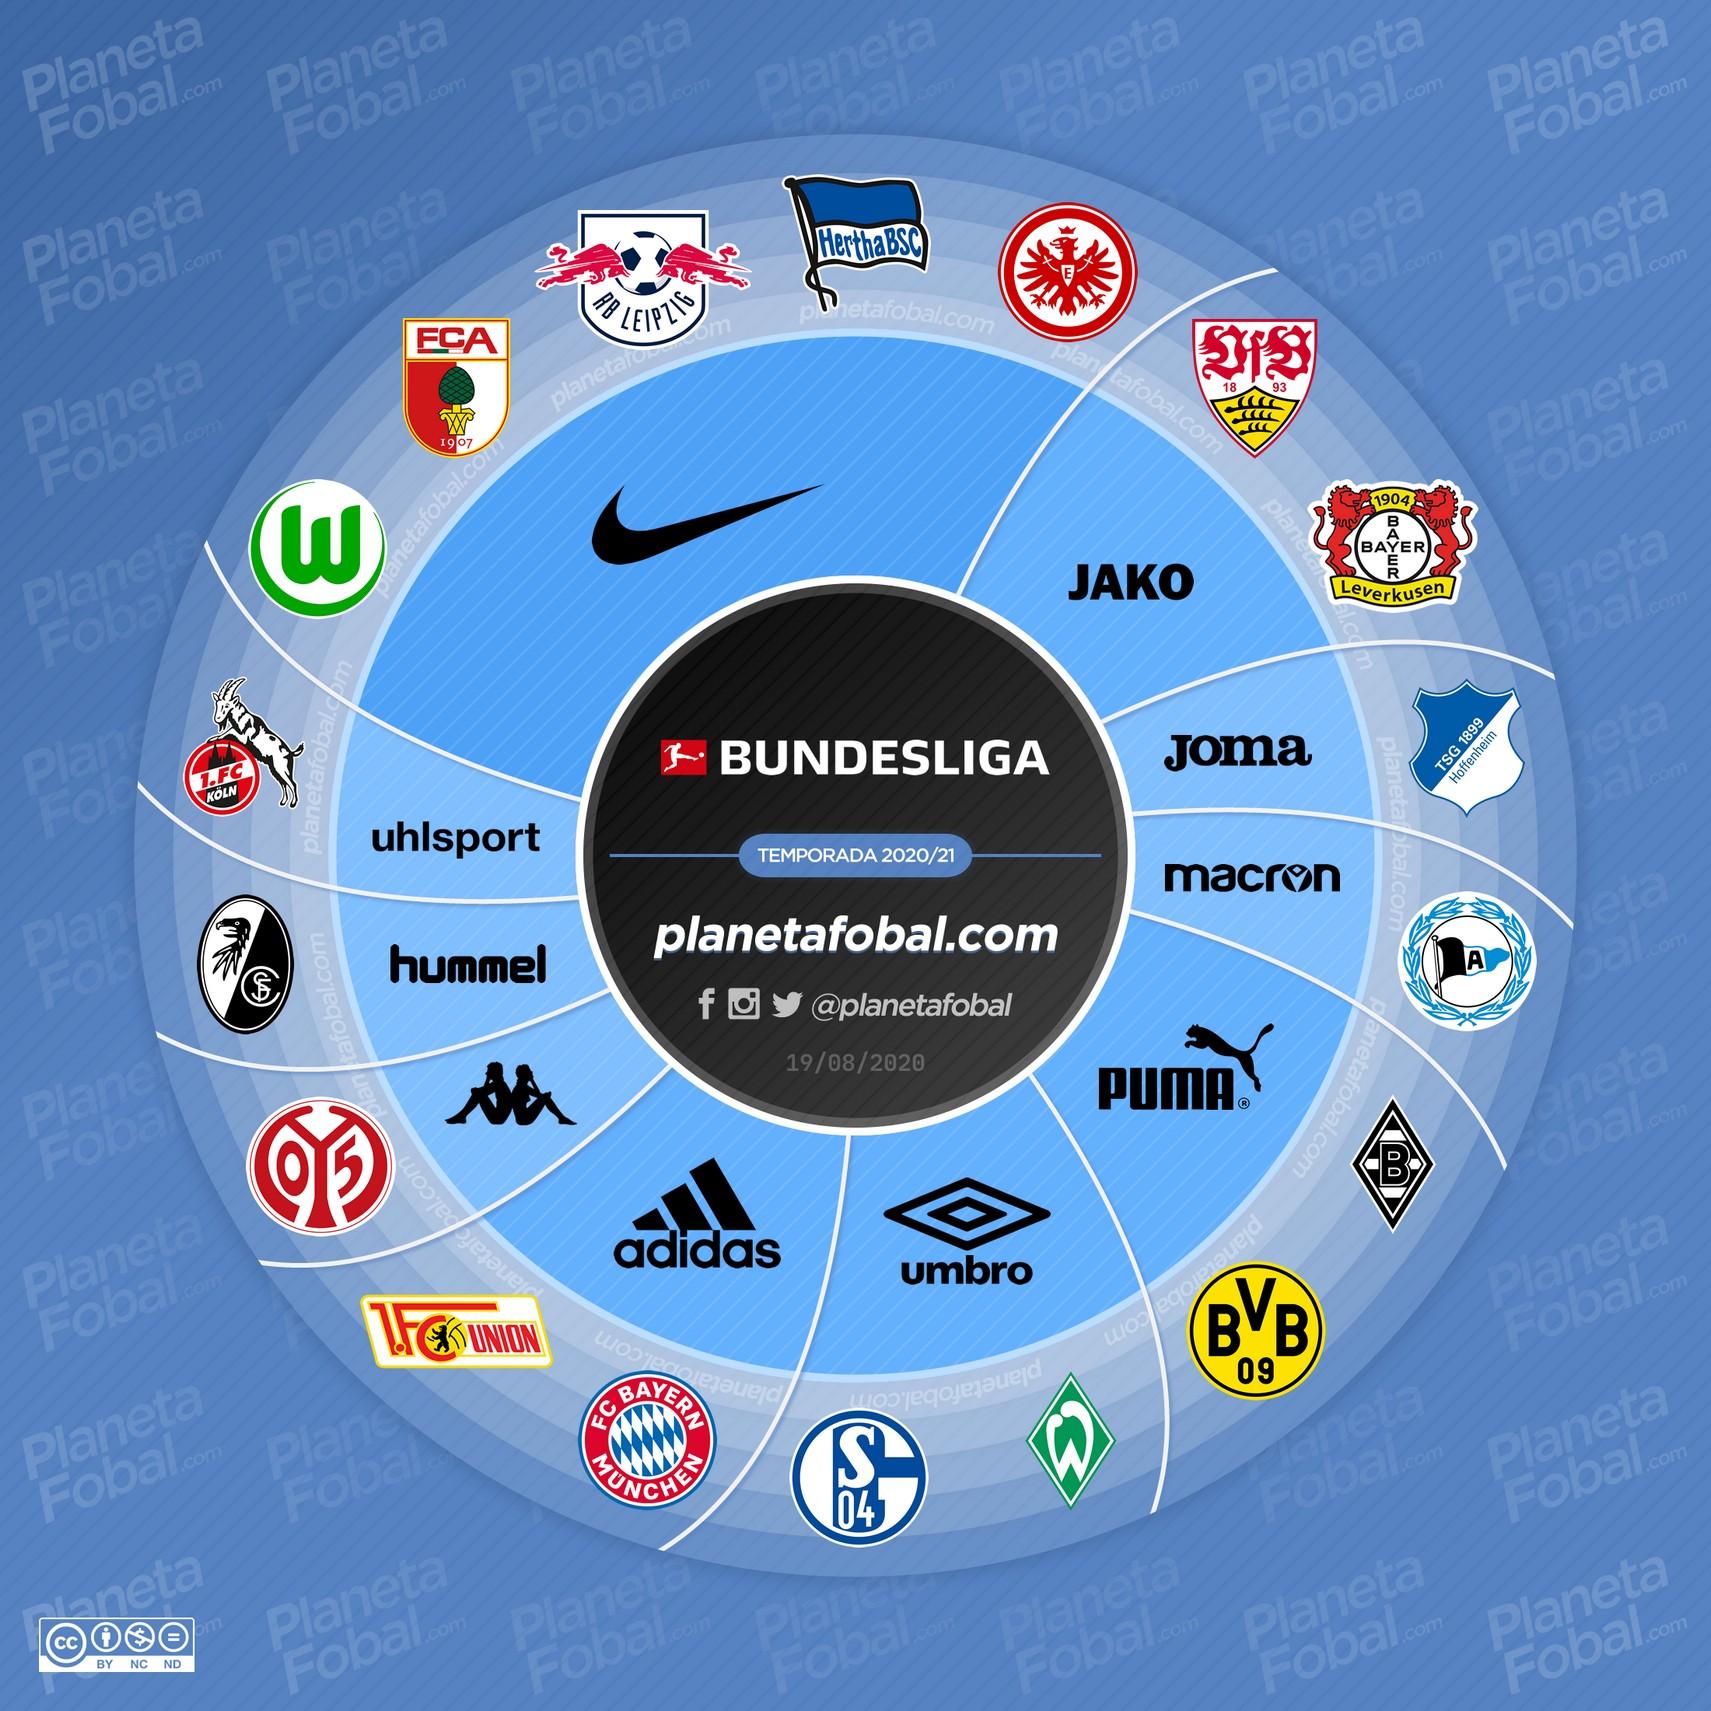 Marcas deportivas de la Bundesliga 2020/2021